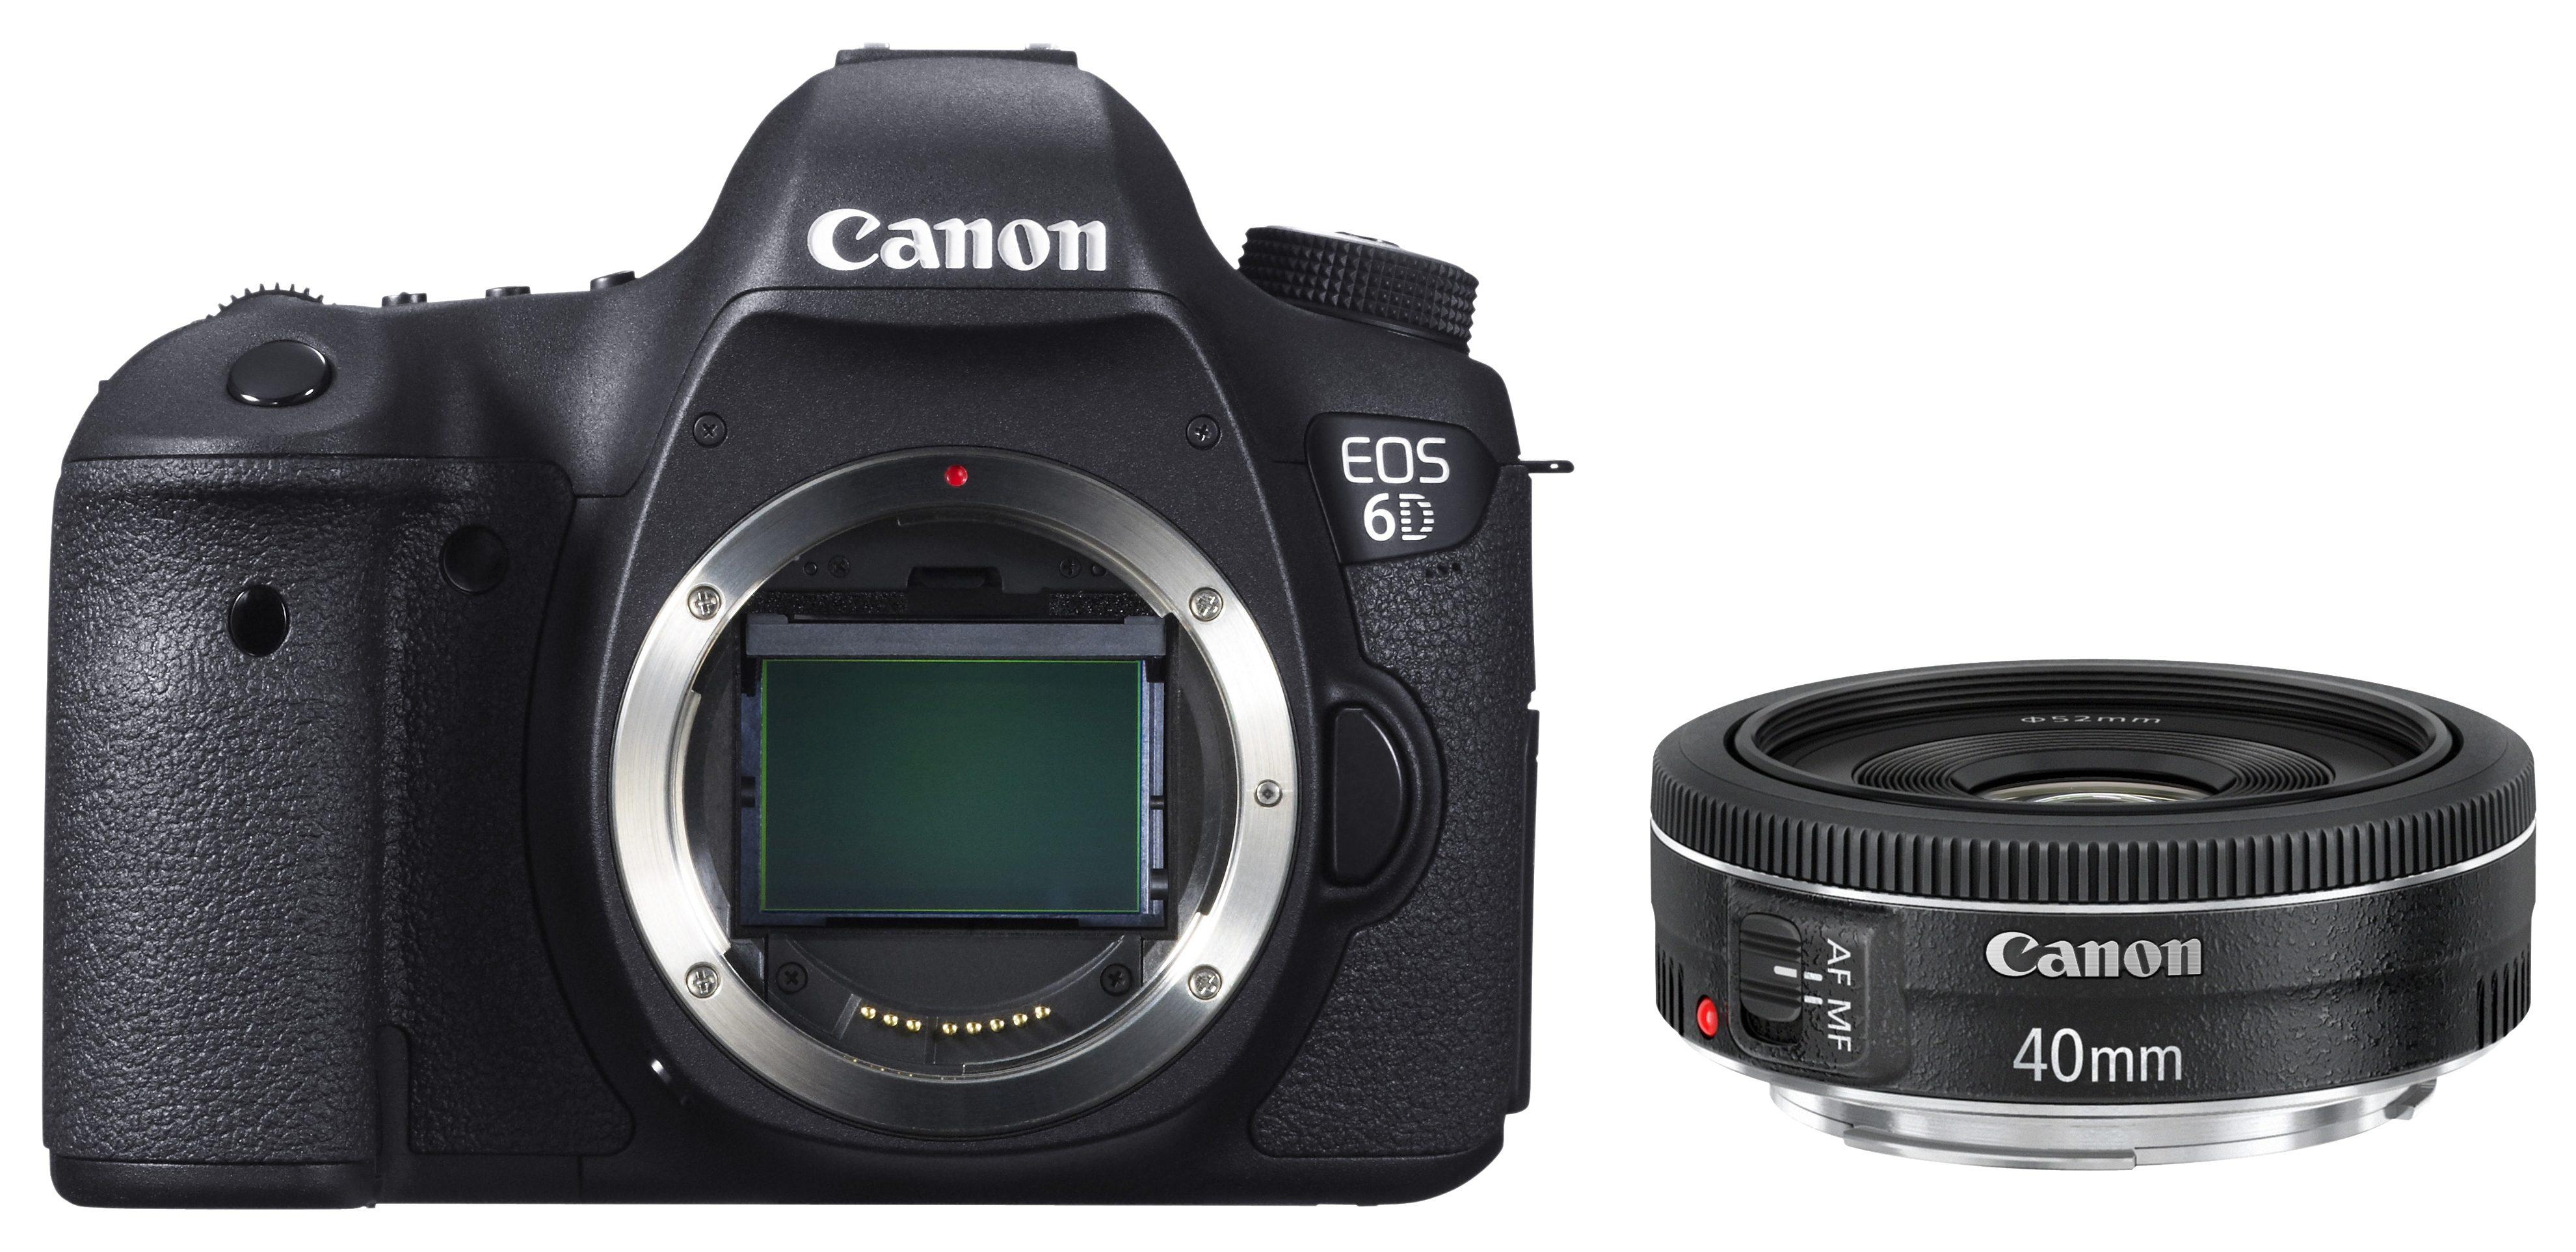 Canon EOS 6D Spiegelreflex Kamera, EF 40 STM F2.8 Pancake, 20,2 Megapixel, 7,7 cm (3 Zoll) Display